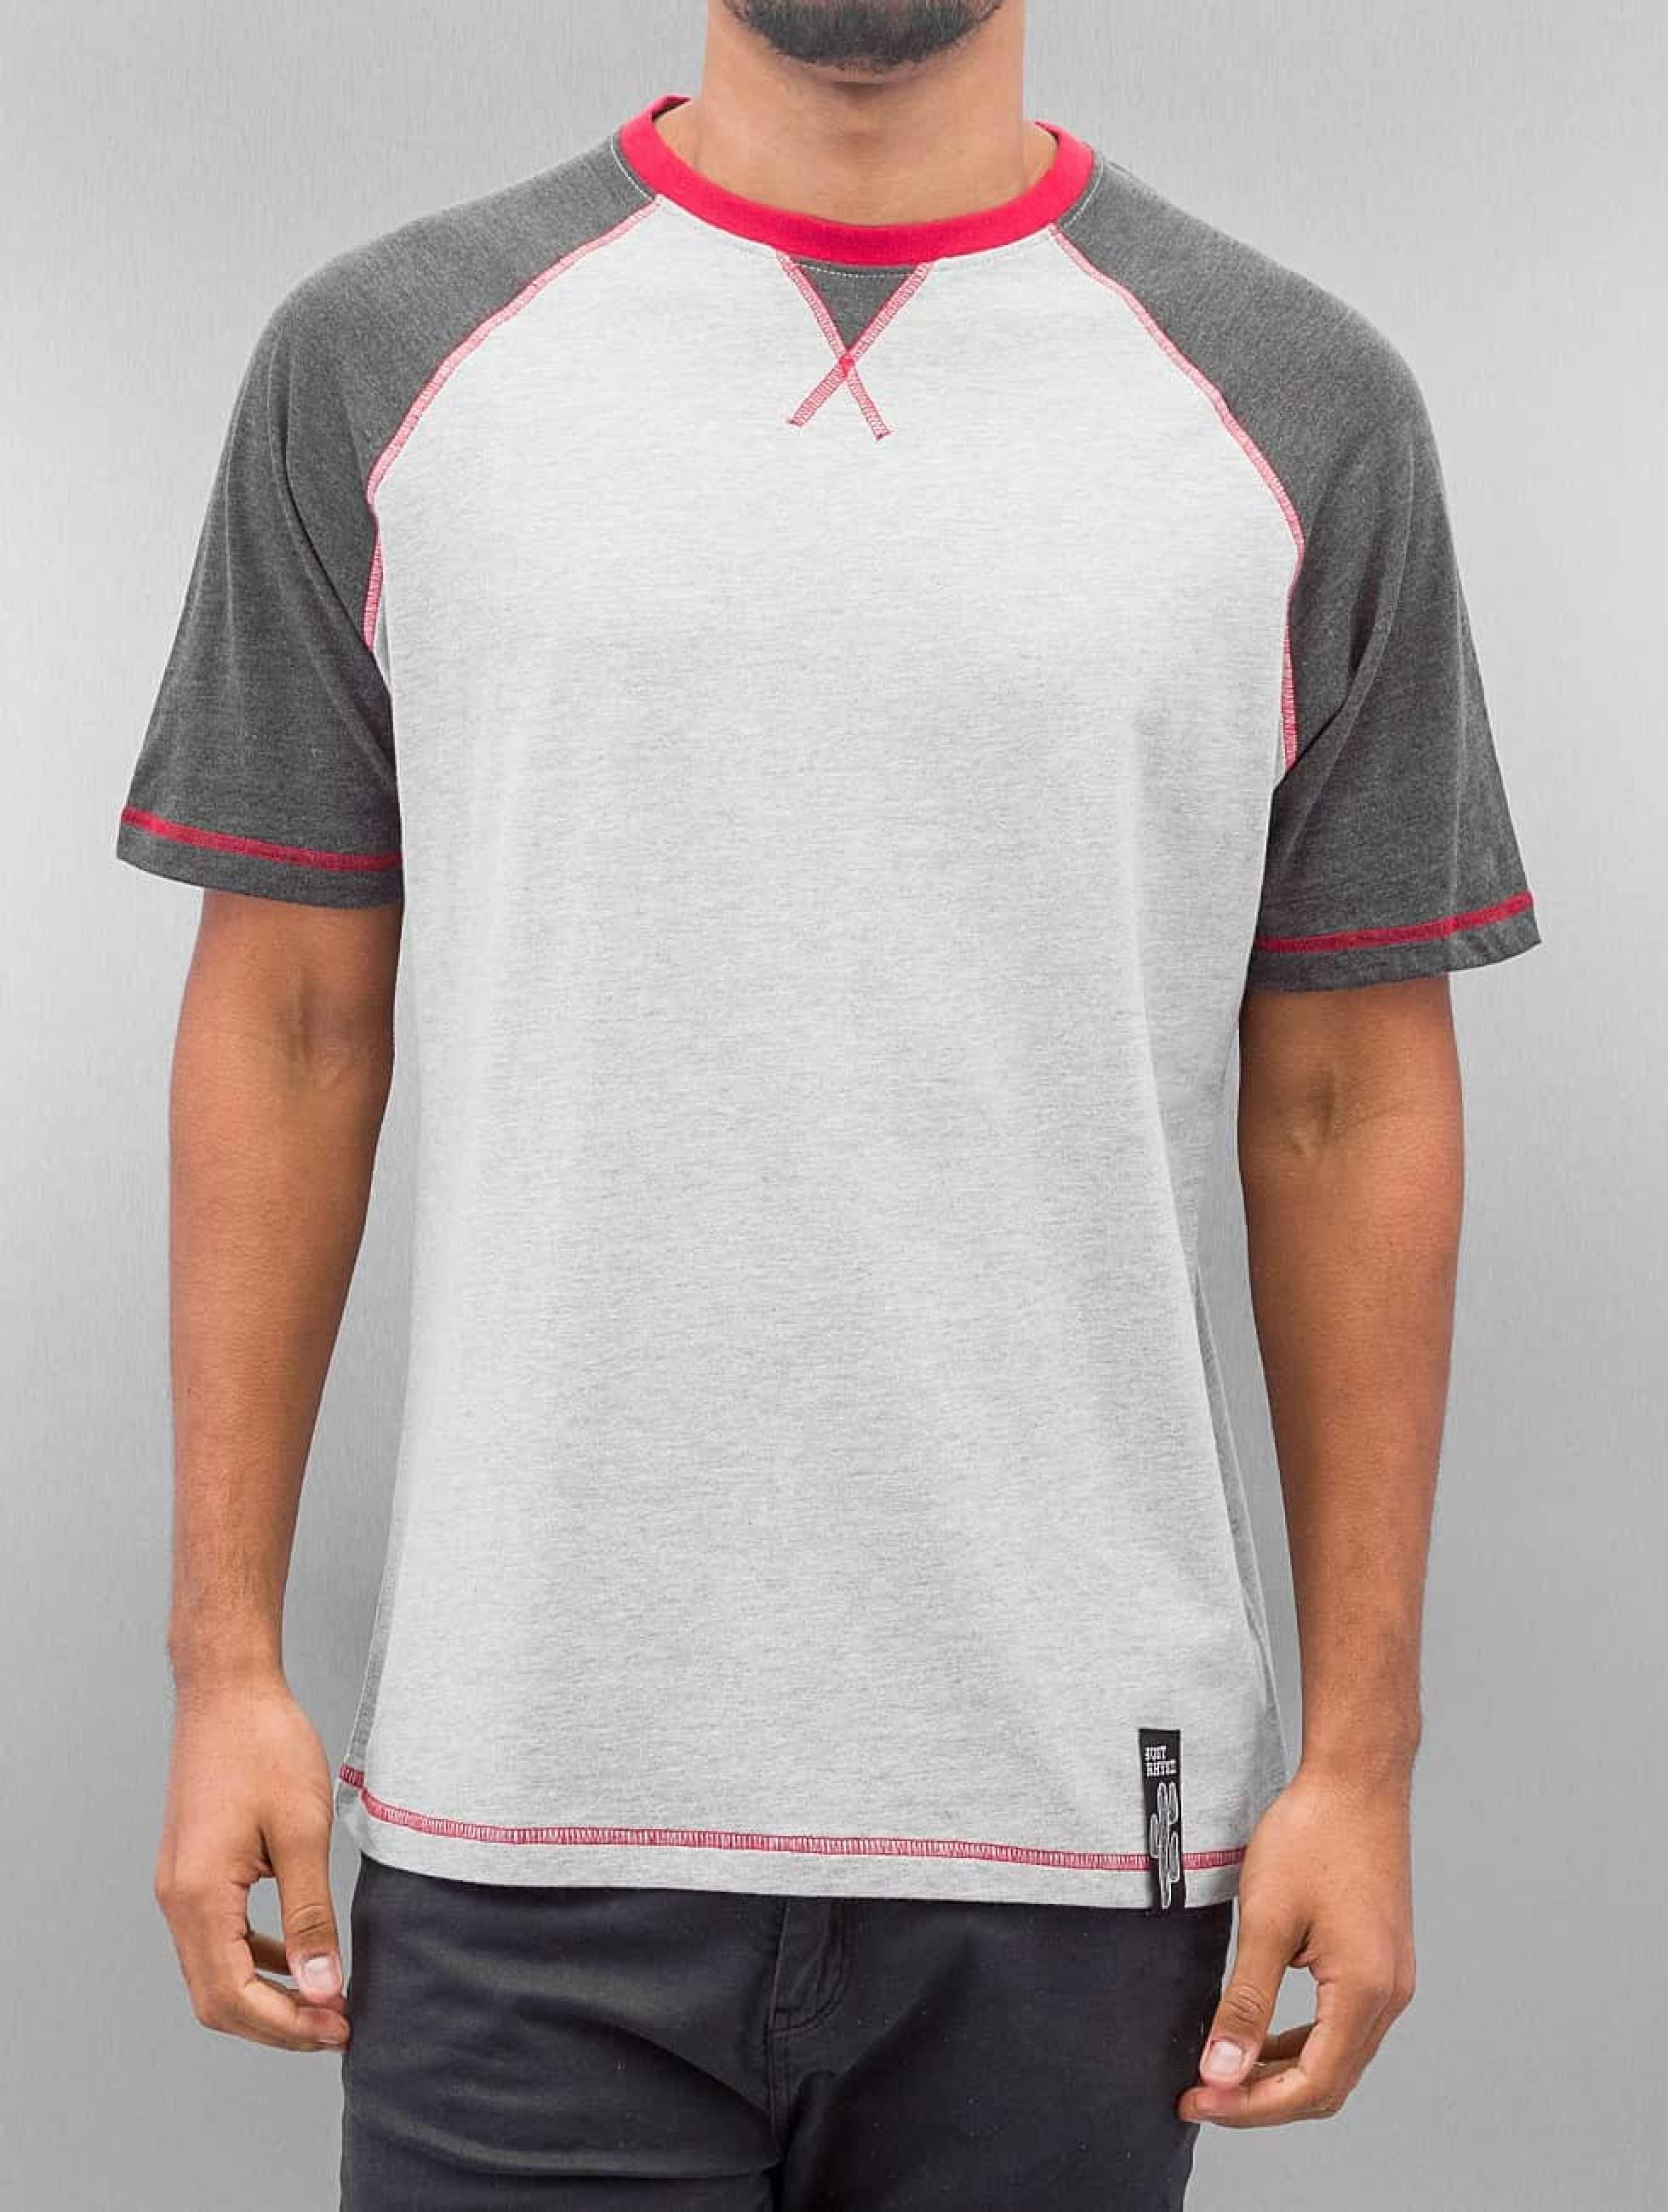 Just Rhyse / T-Shirt Maurus in grey S